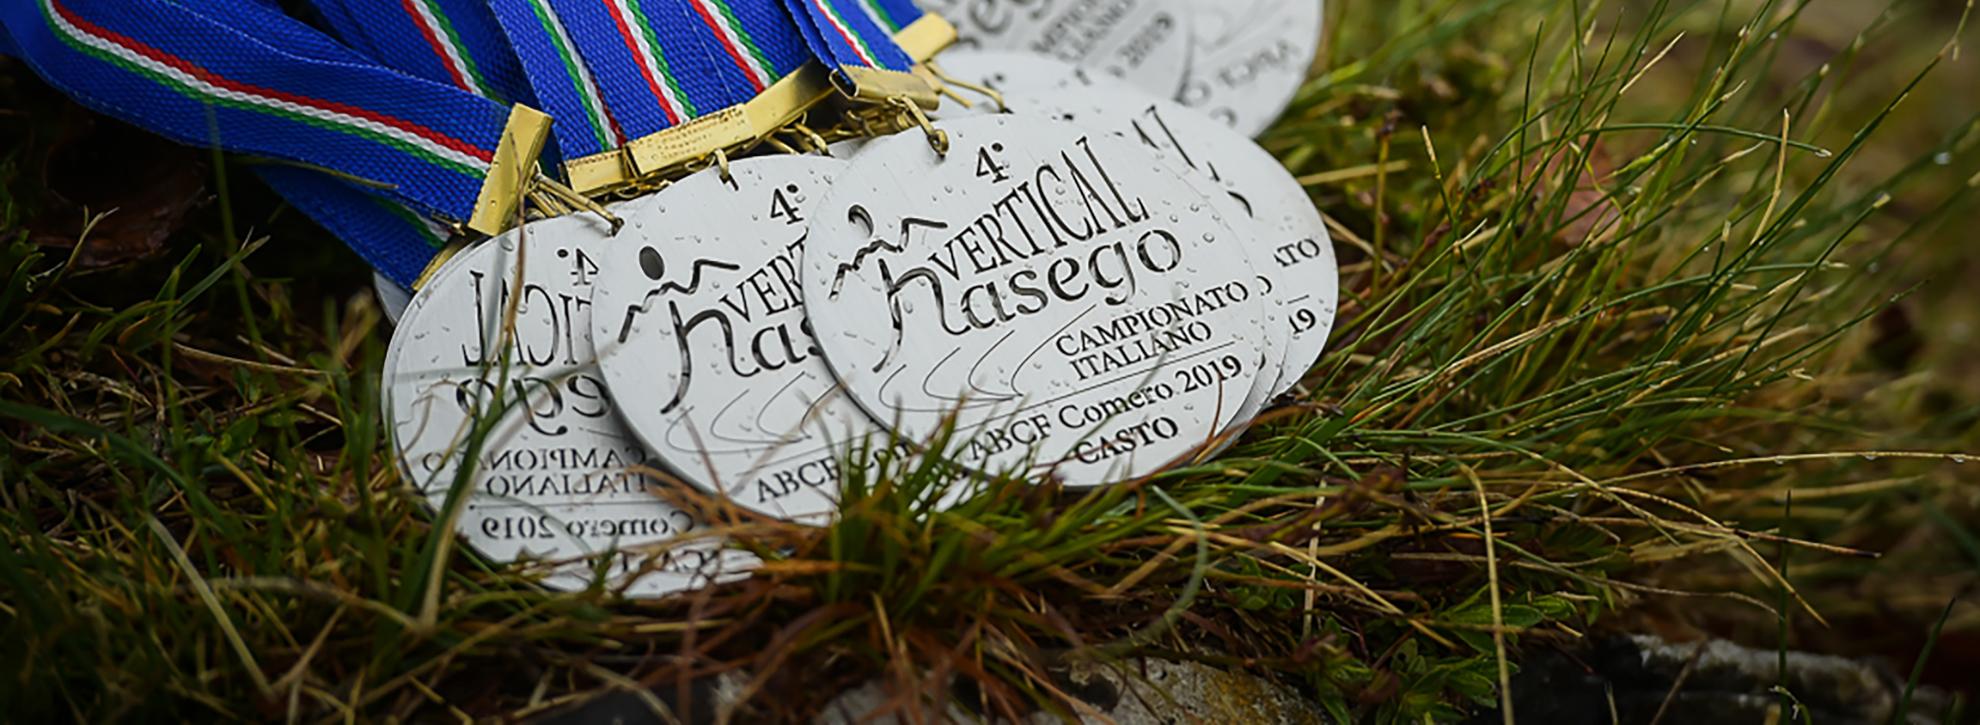 Vertical/ Trofeo Nasego 2019 Italian Mountain Running Championship